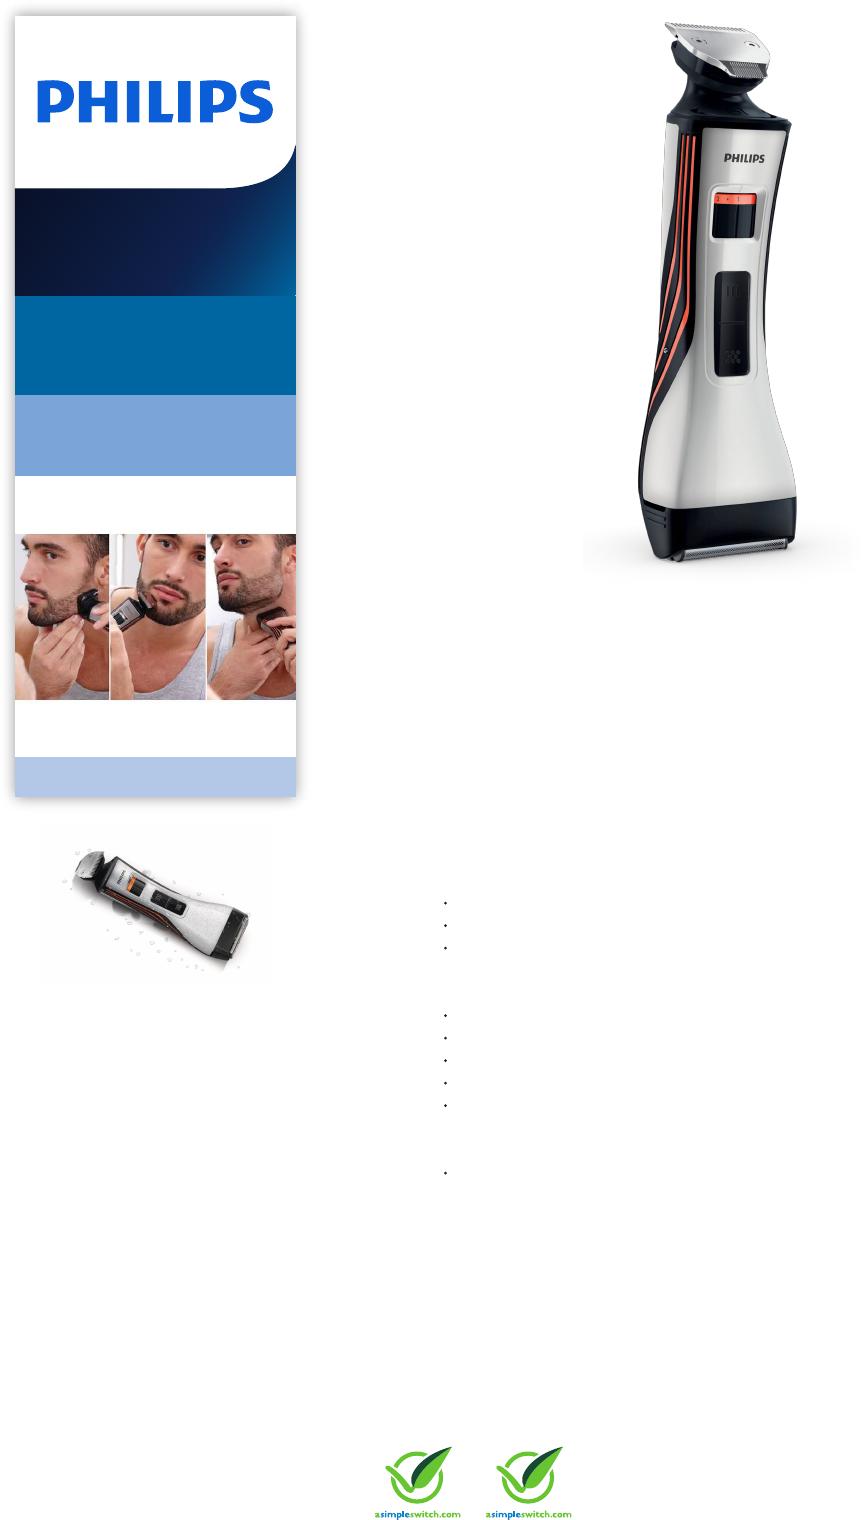 bc7cbd9c153 Philips QS6140/32 Waterproof Styler & Shaver Leaflet Qs6140 32 Pss Engnz